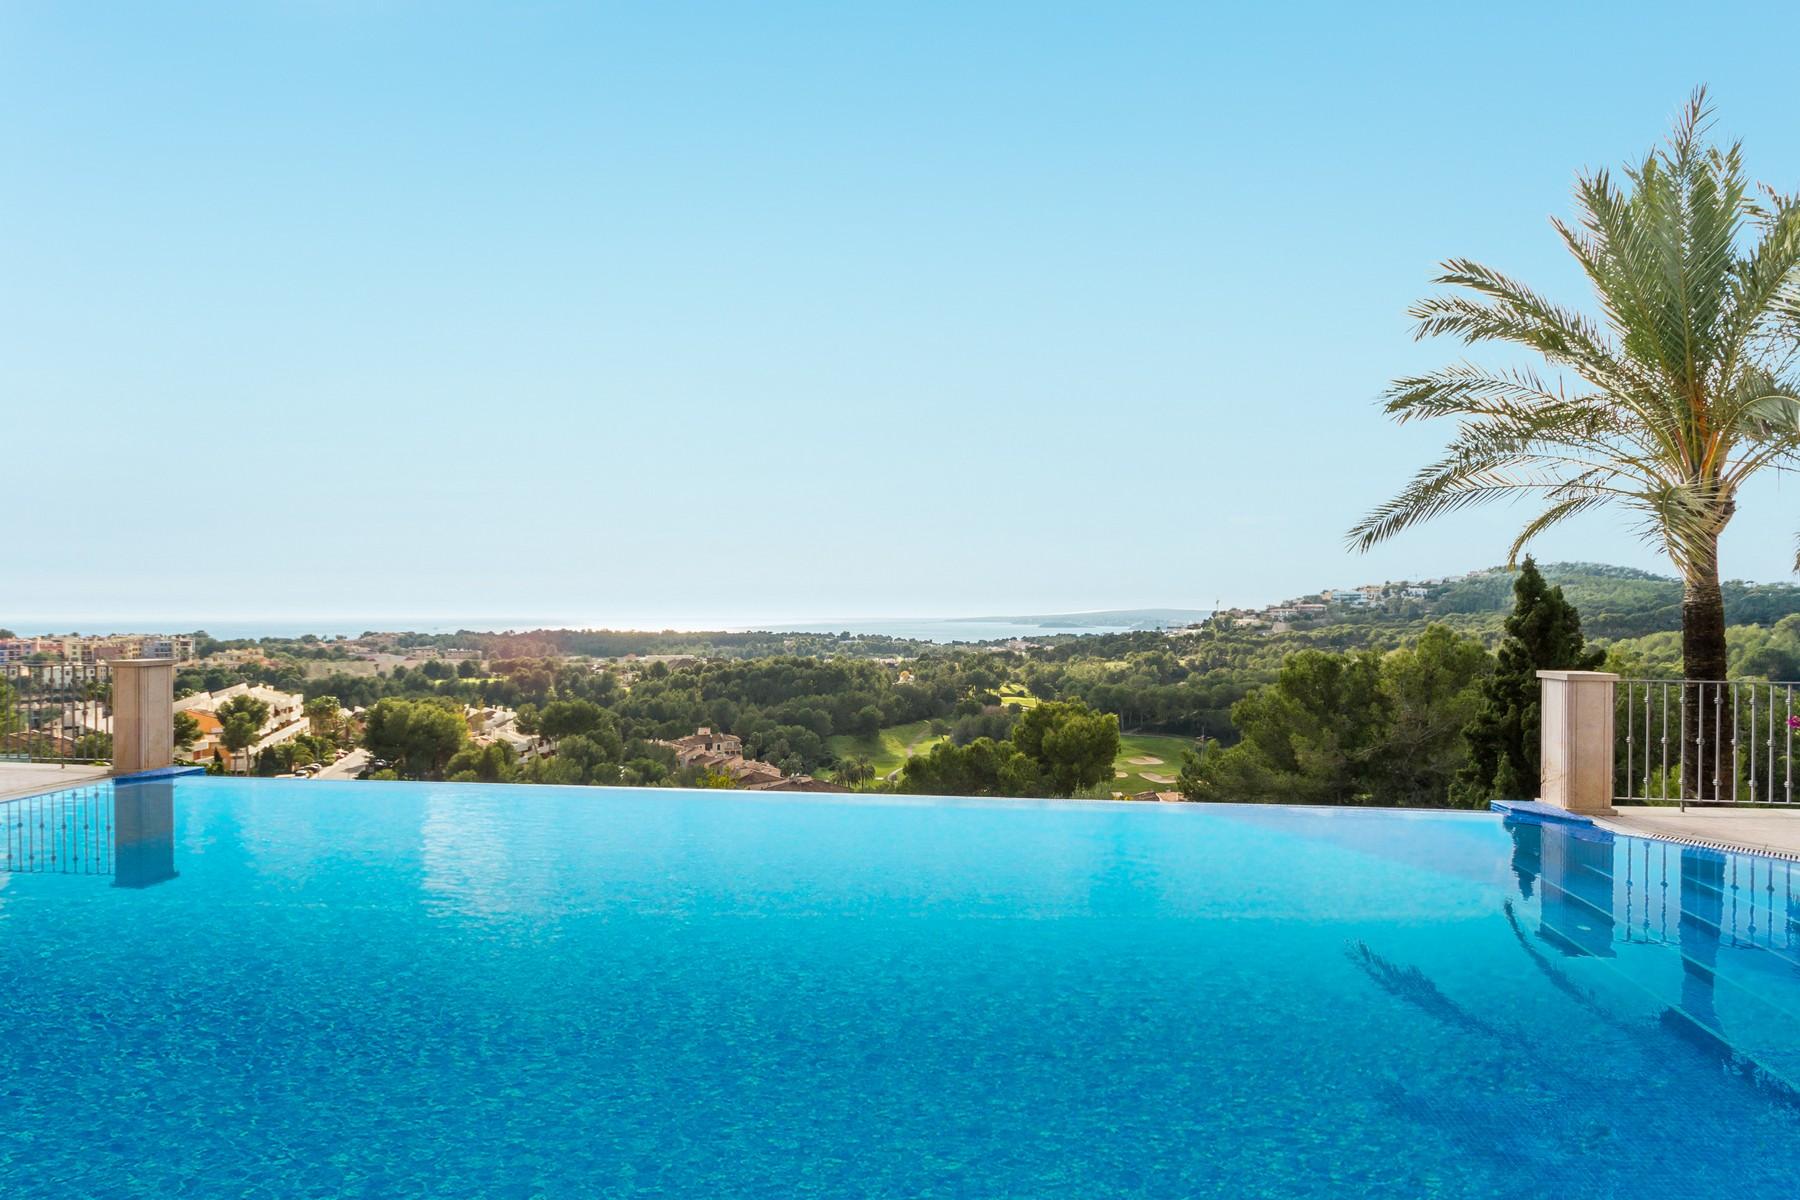 Casa para uma família para Venda às Luxury villa in prime location in Bendinat Bendinat, Palma De Maiorca, 07181 Espanha